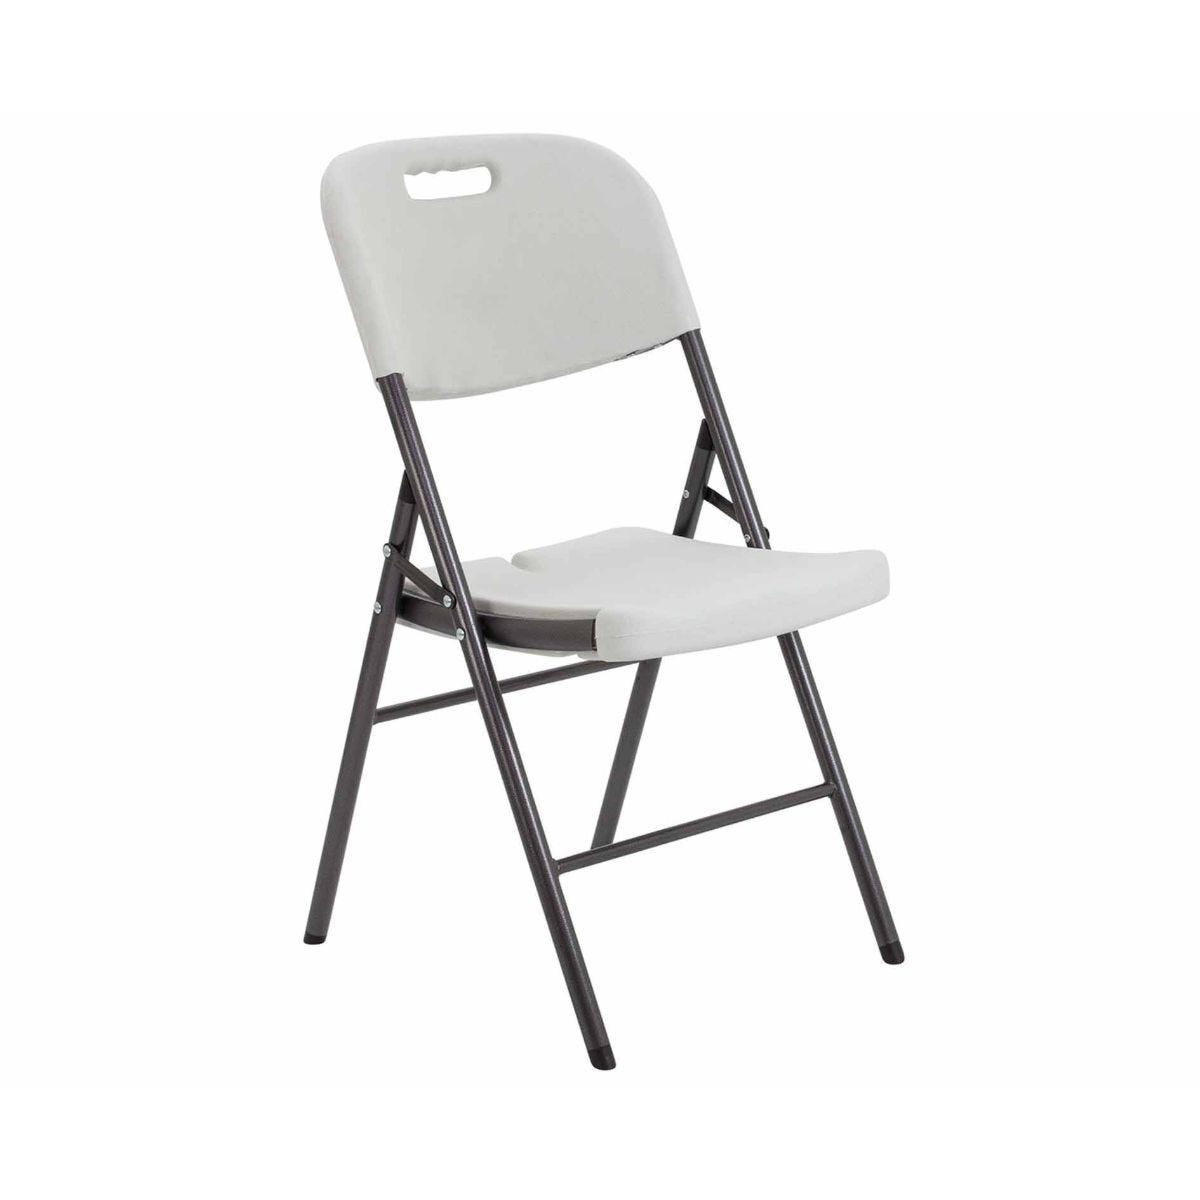 TC Office Morph Polypropylene Folding Chair